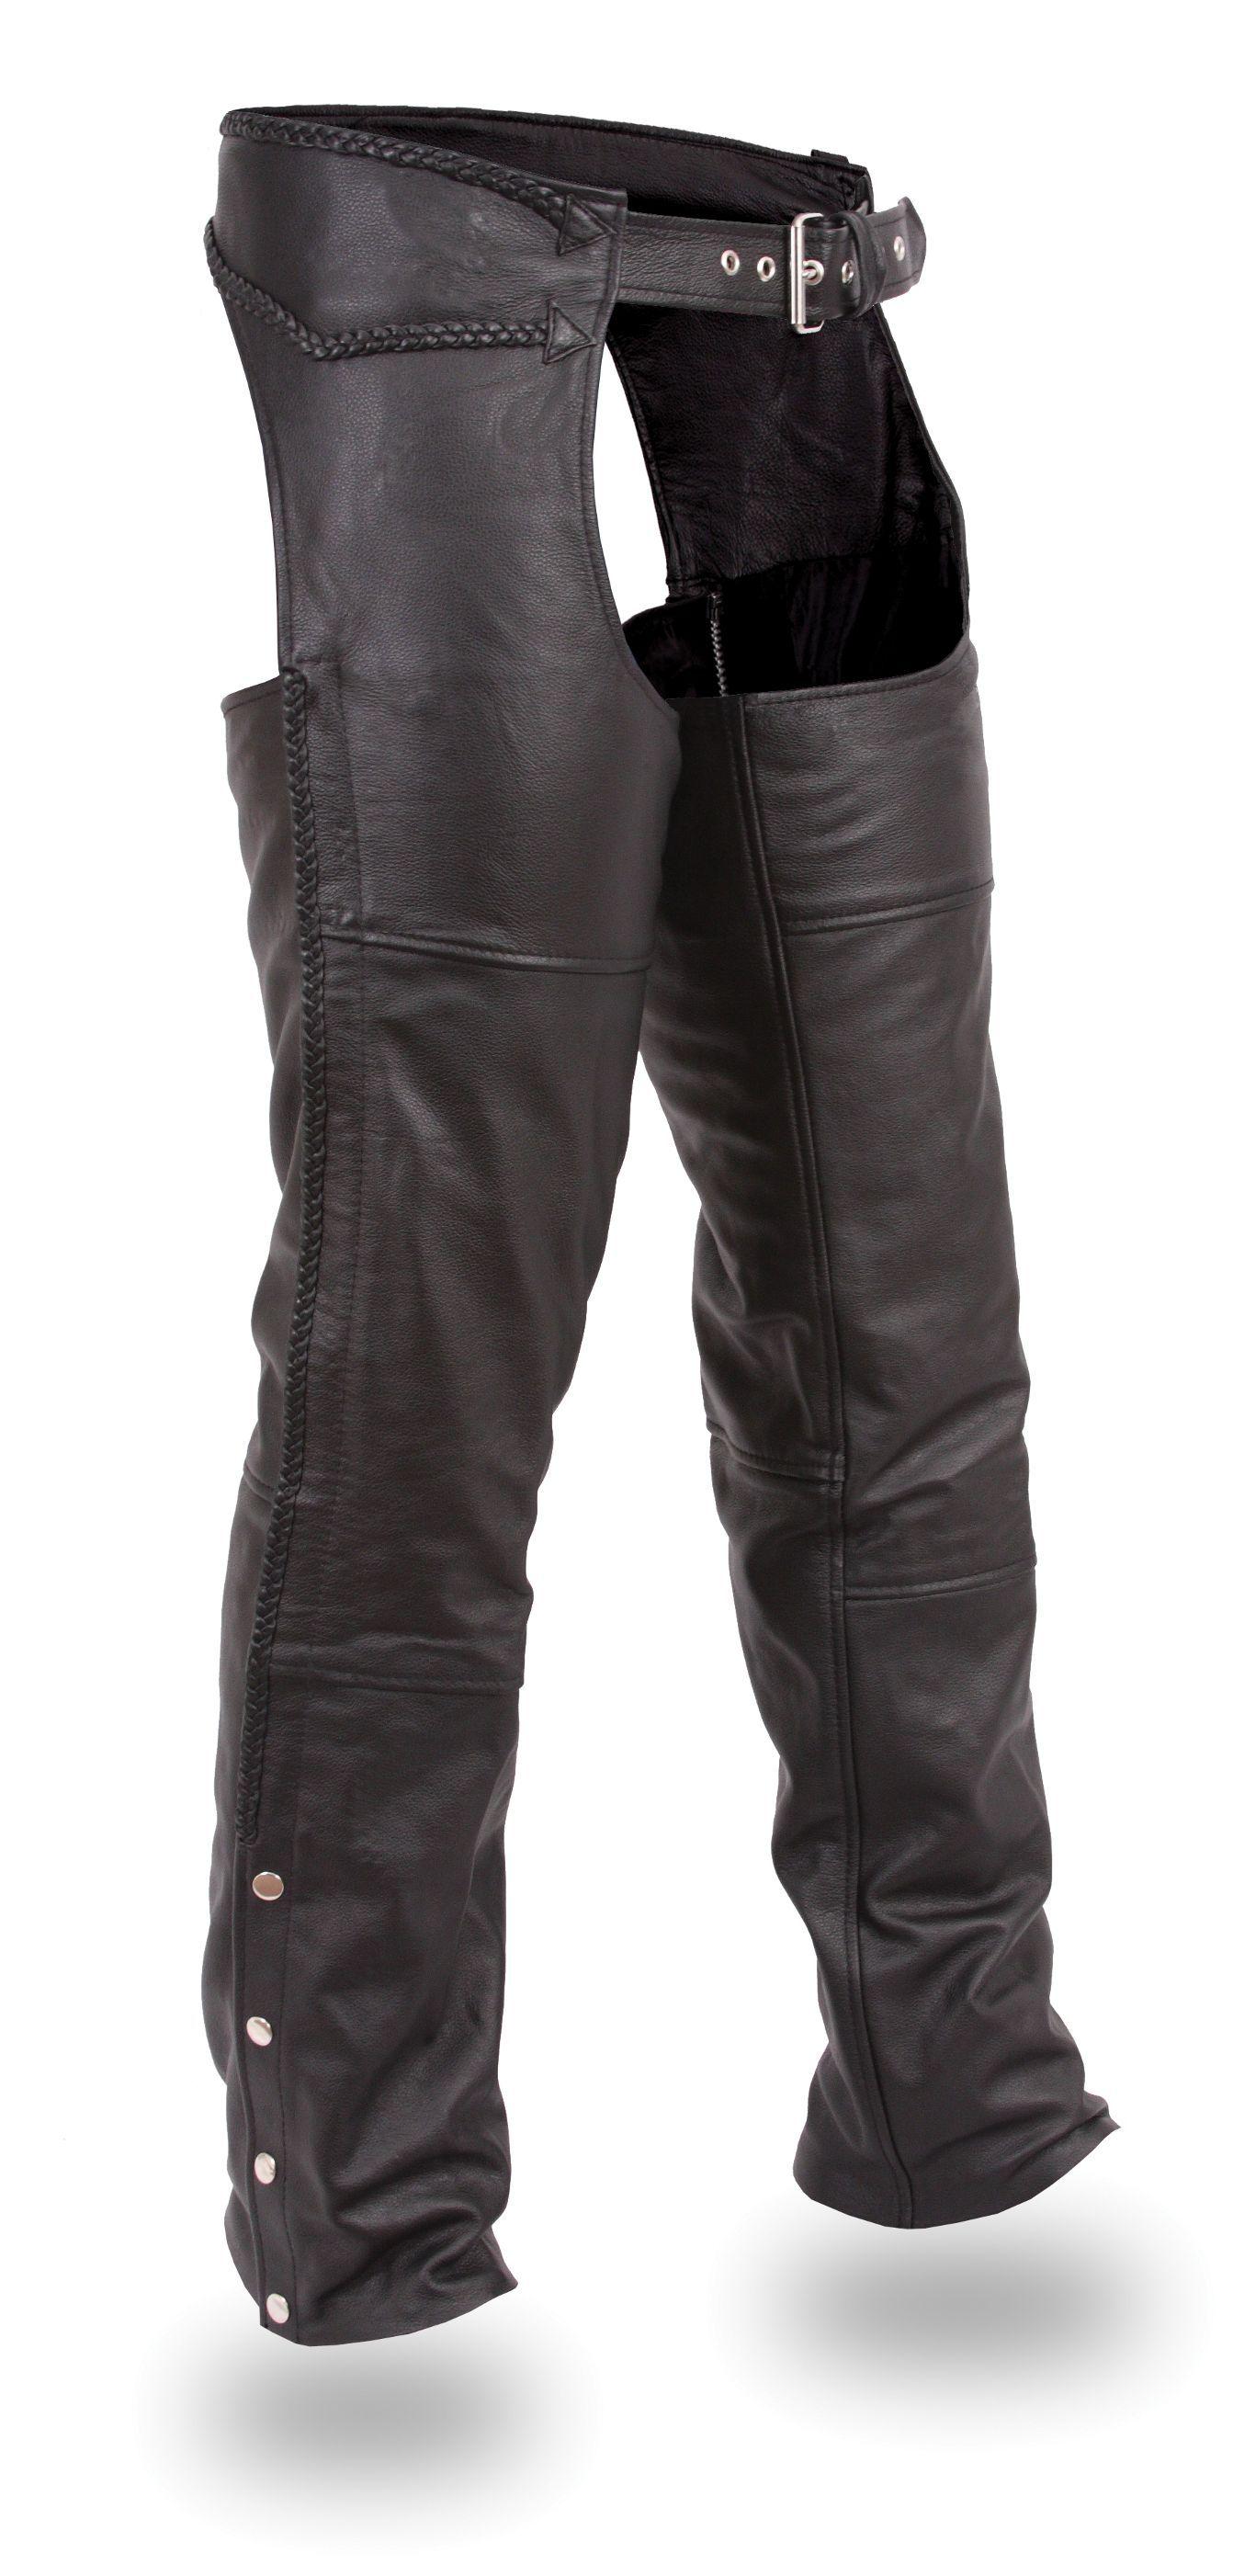 Leather Chaps - Biker Chaps - Born 2 Ride